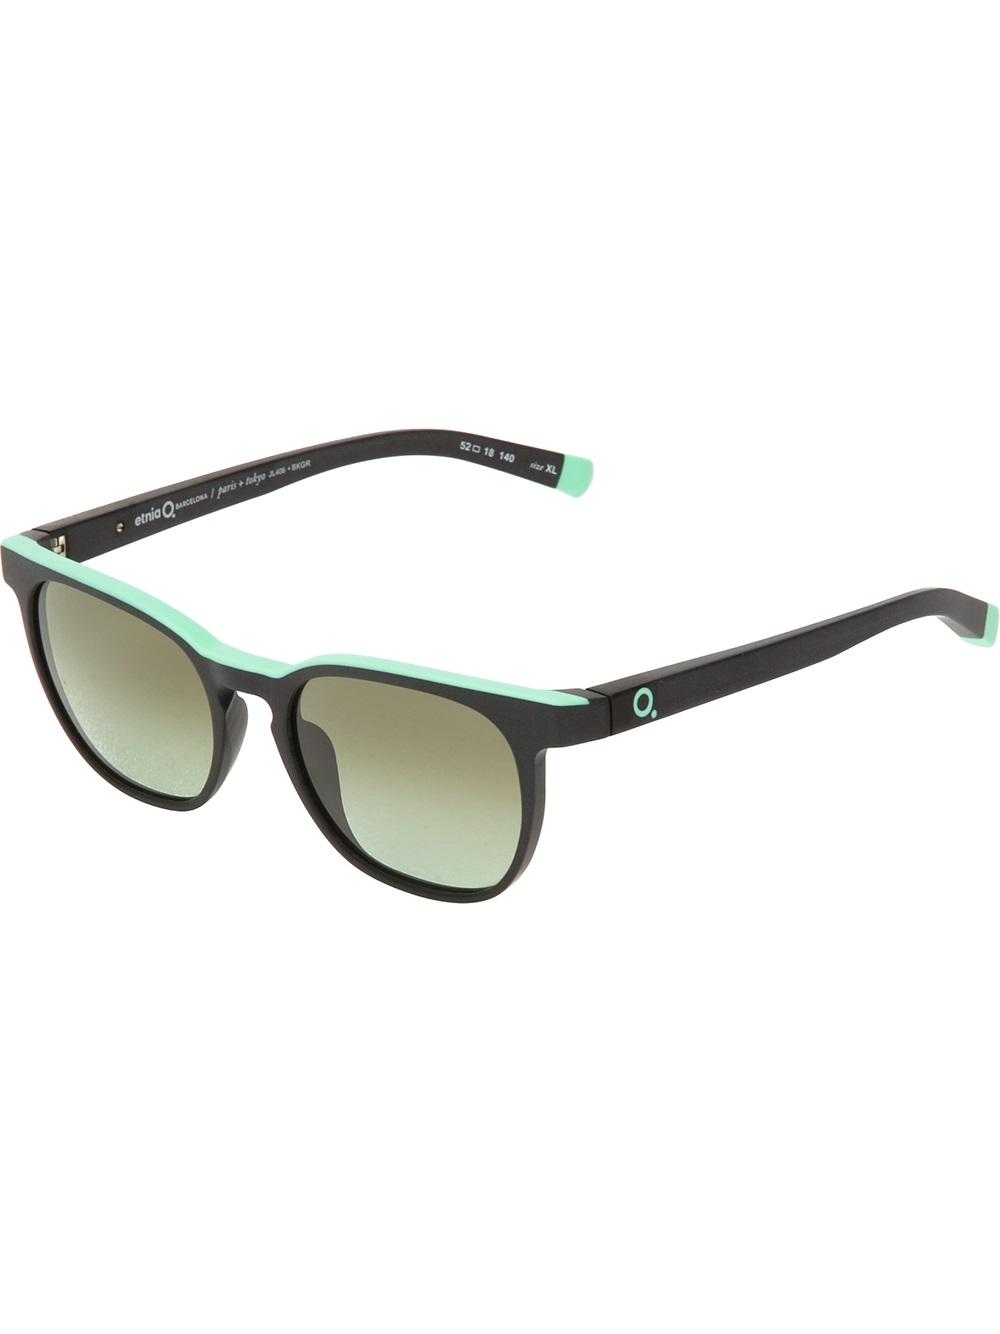 f7893a9b30e Etnia Barcelona Wayfarer Sunglasses in Black - Lyst